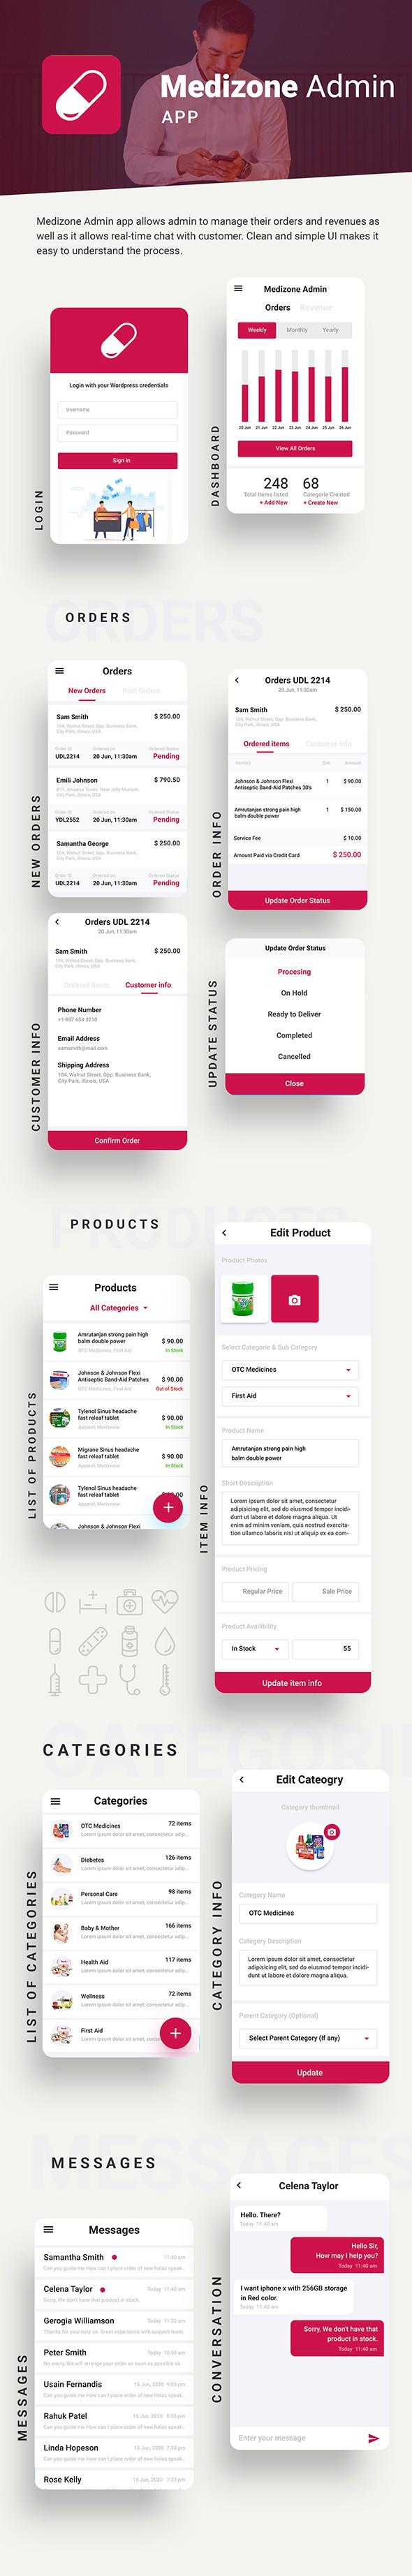 Farmácia eCommerce Android App + Medicamento online iOS App Template    2 aplicativos    HTML + CSS IONIC 3 - 4